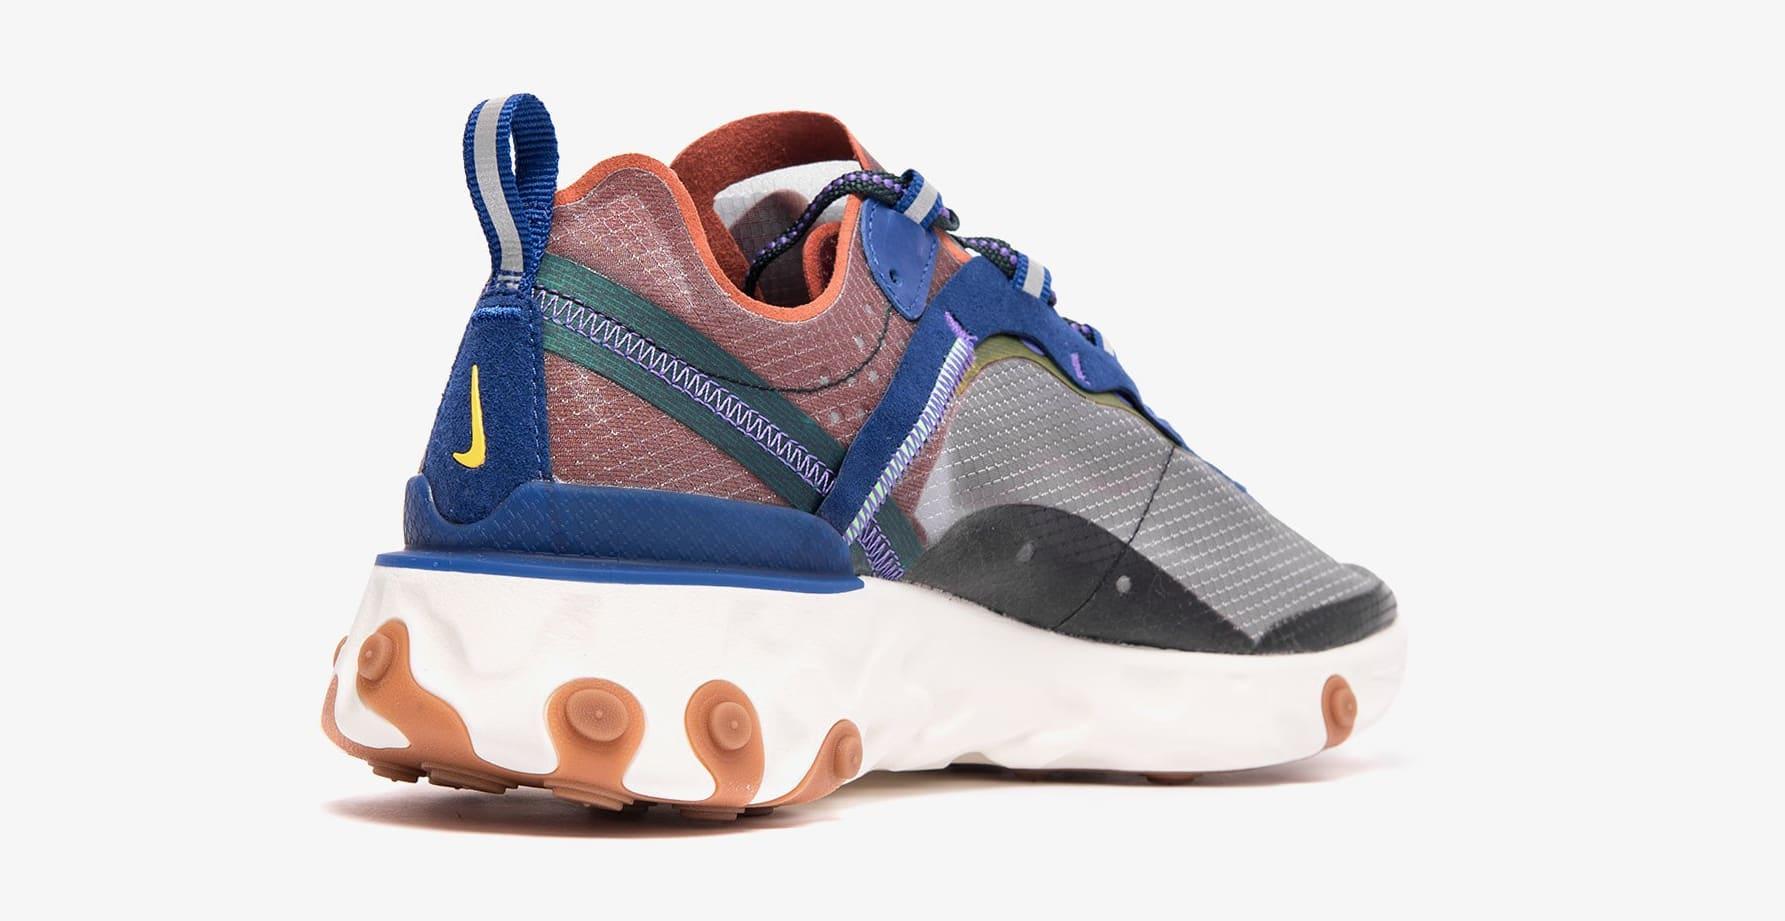 Nike React Element 87 AQ1090-200 (Heel)